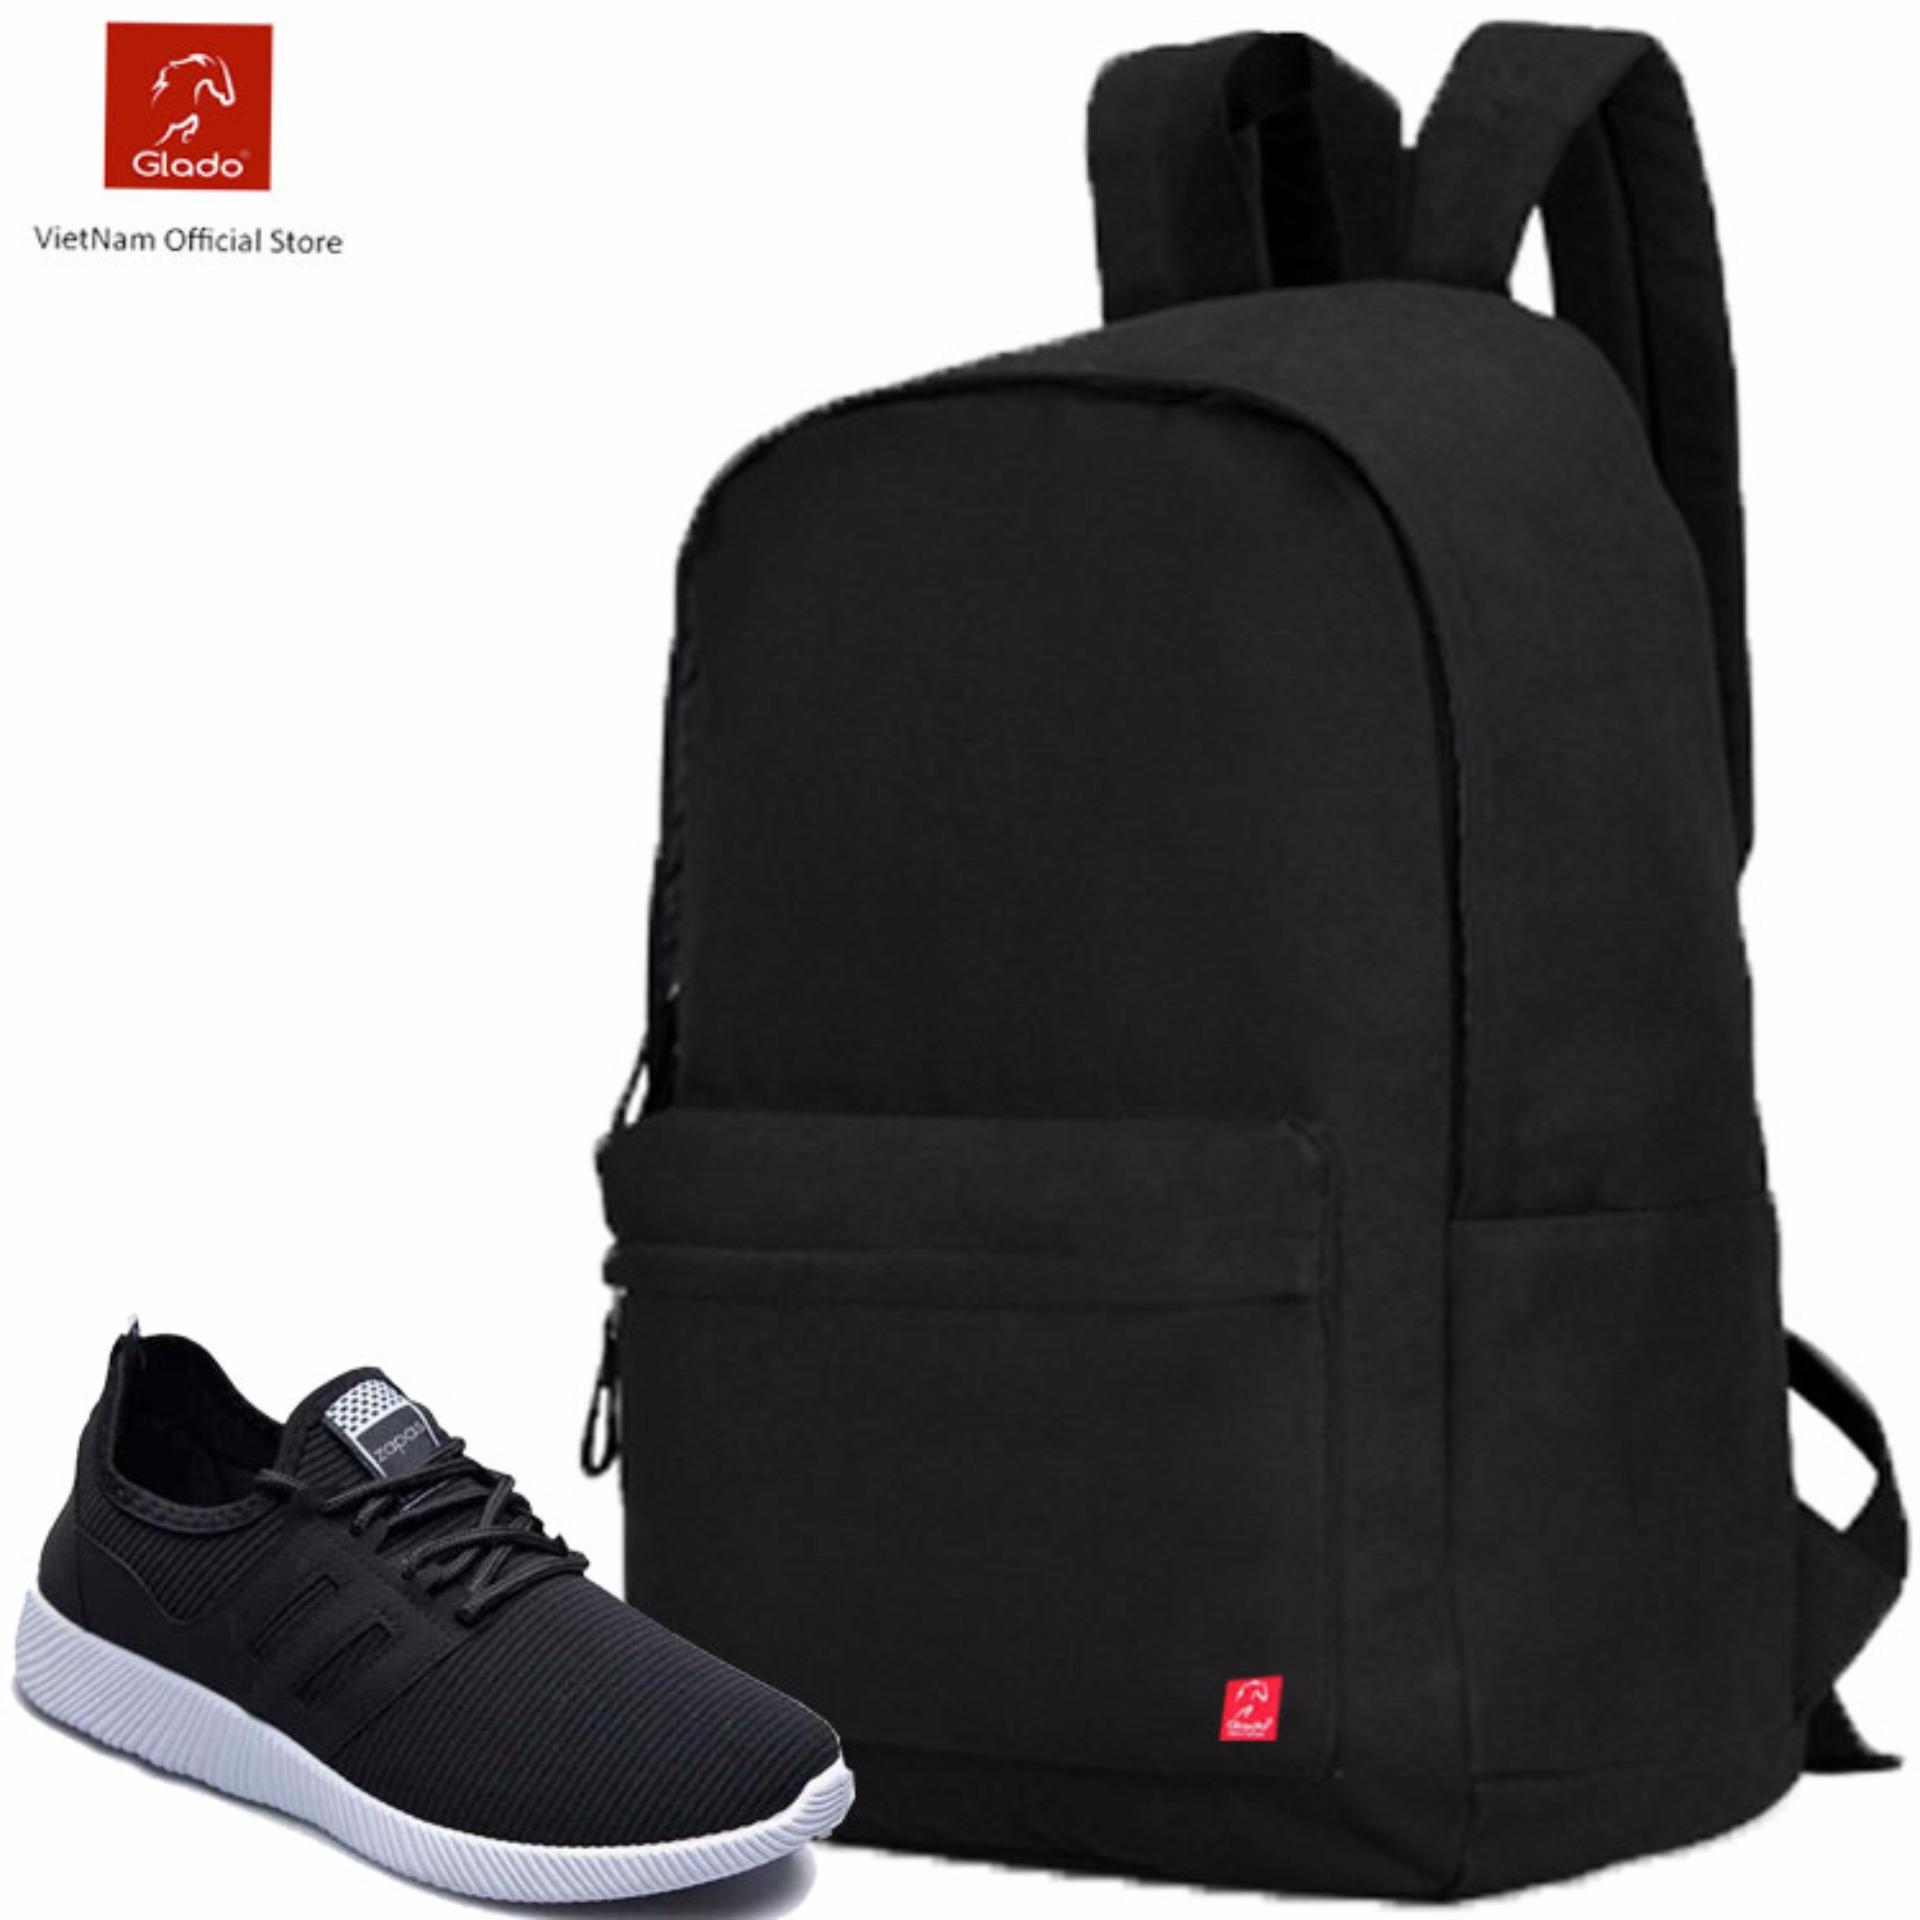 Combo Balo Cylinder Laptop BLL002BA + Giày Sneaker GS068BA (Đen) – CB021